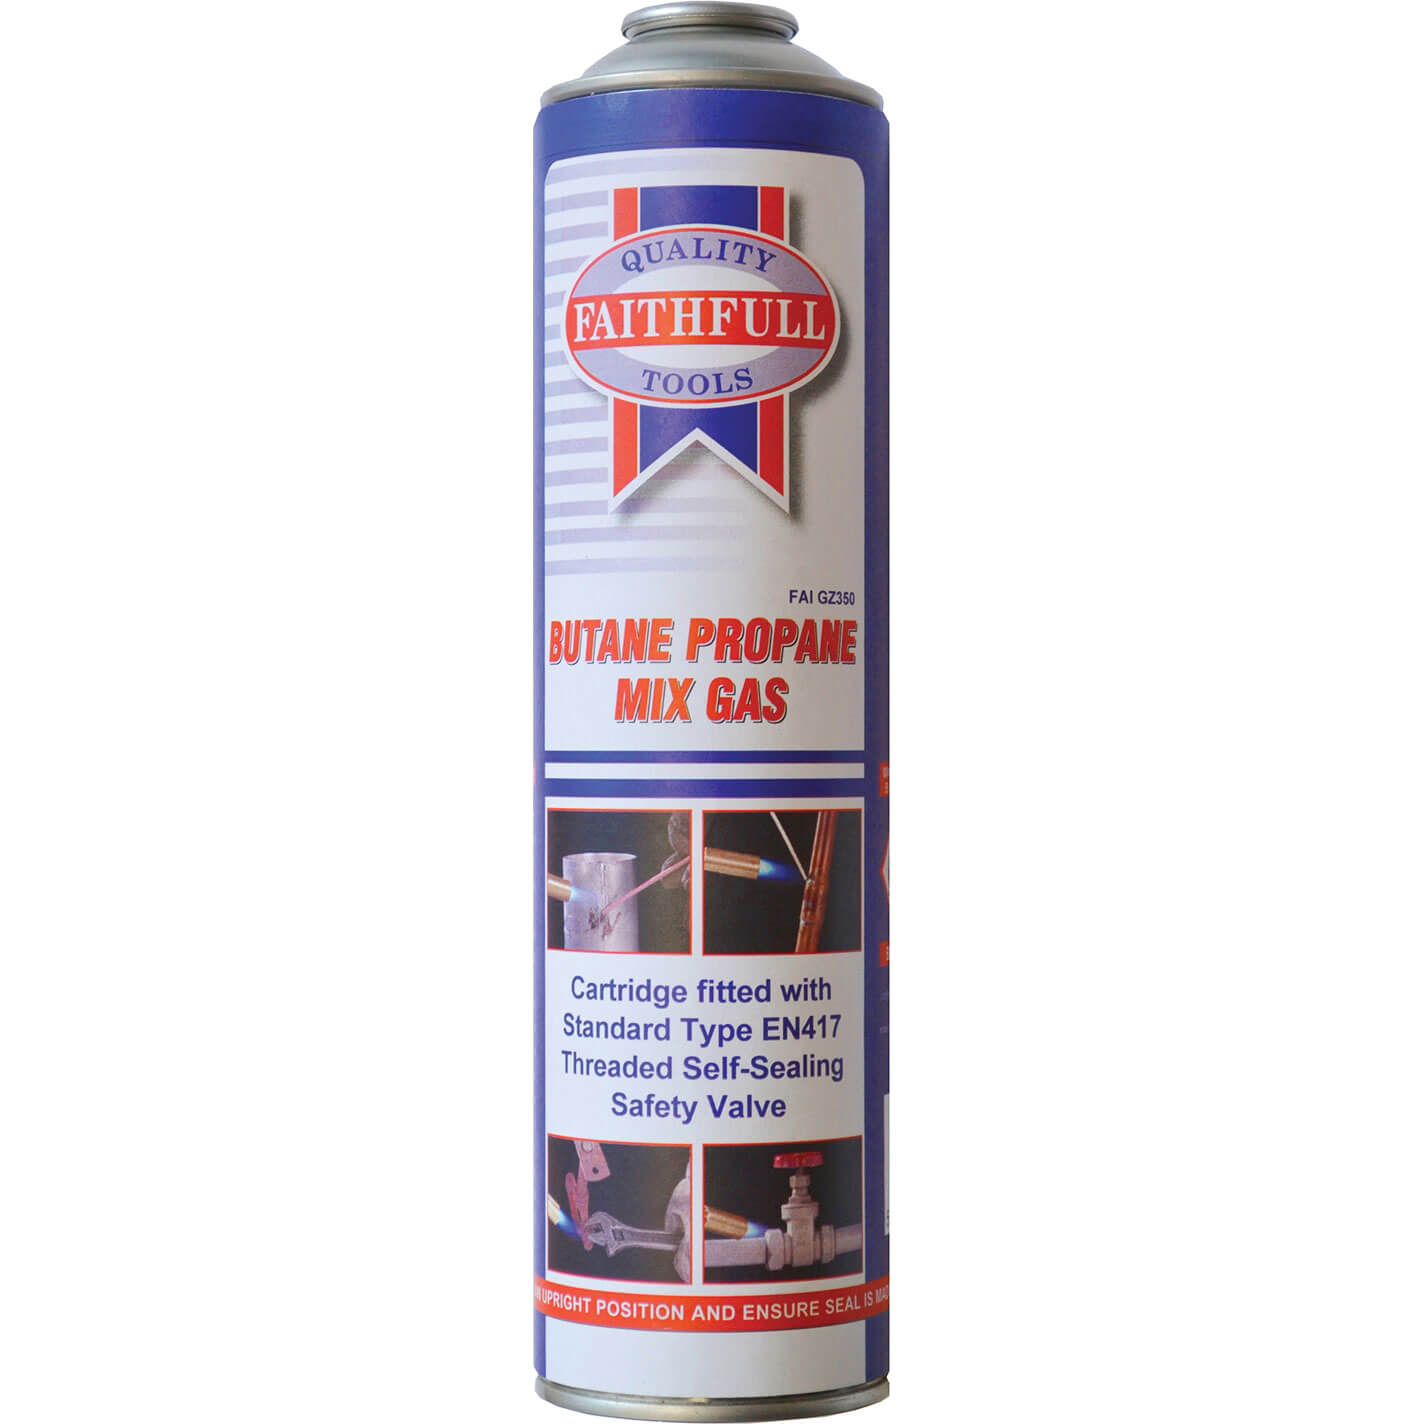 Image of Faithfull Butane Propane Gas Cartridge 350g